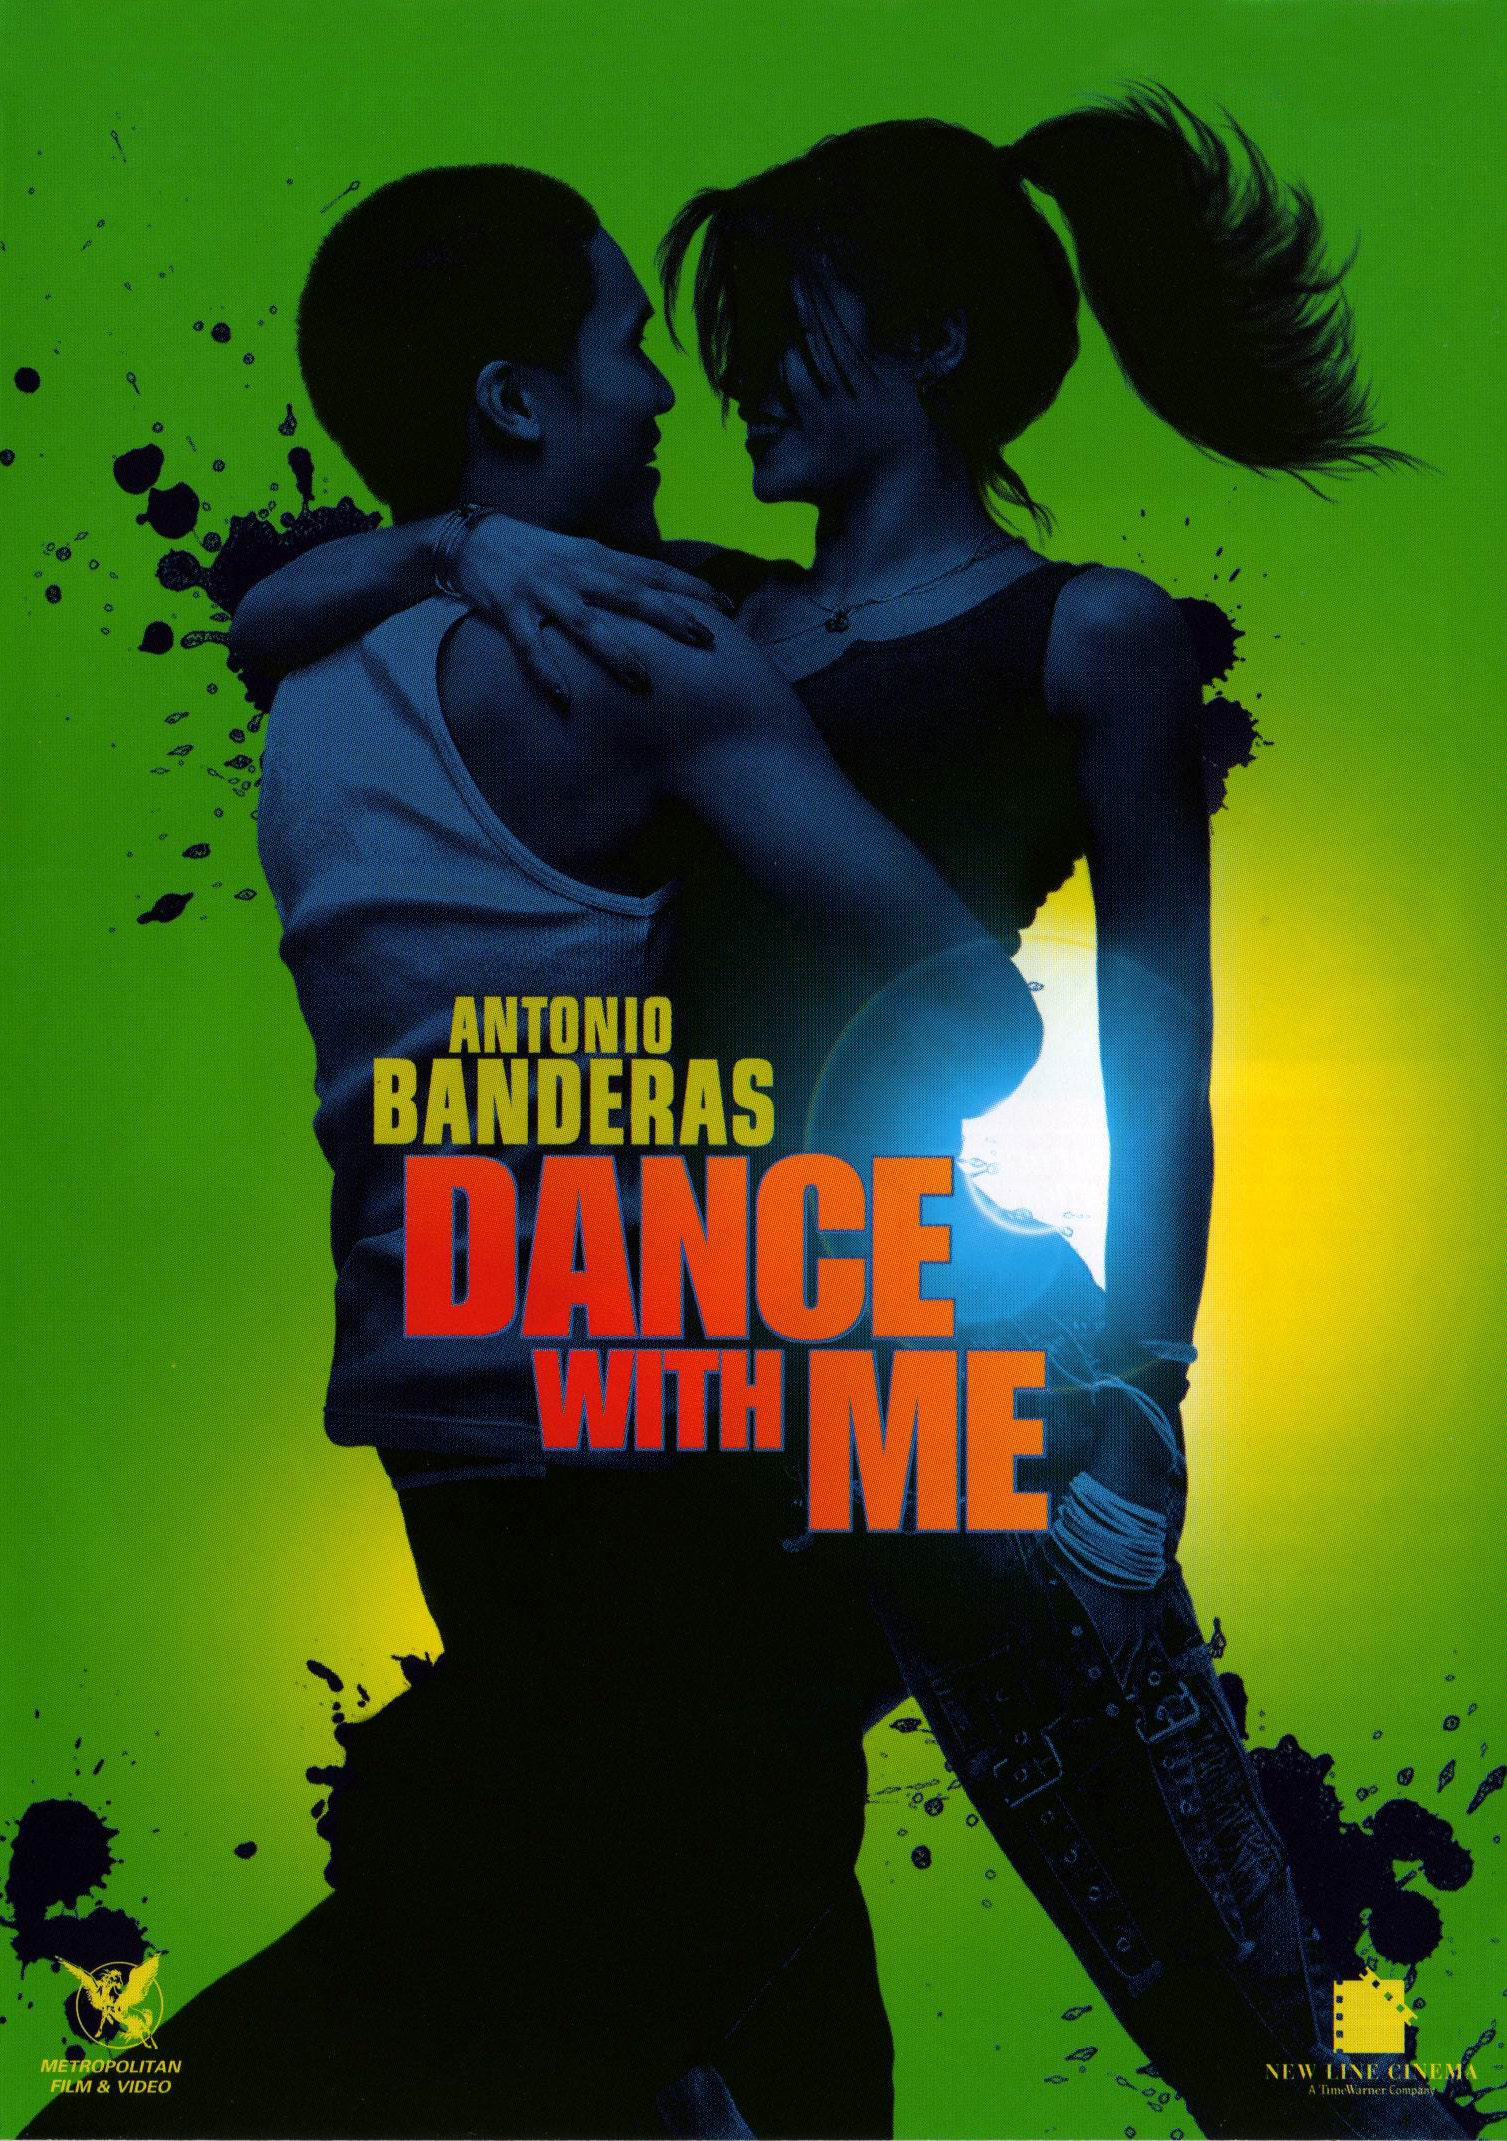 Regarder Dance with me en streaming gratuit